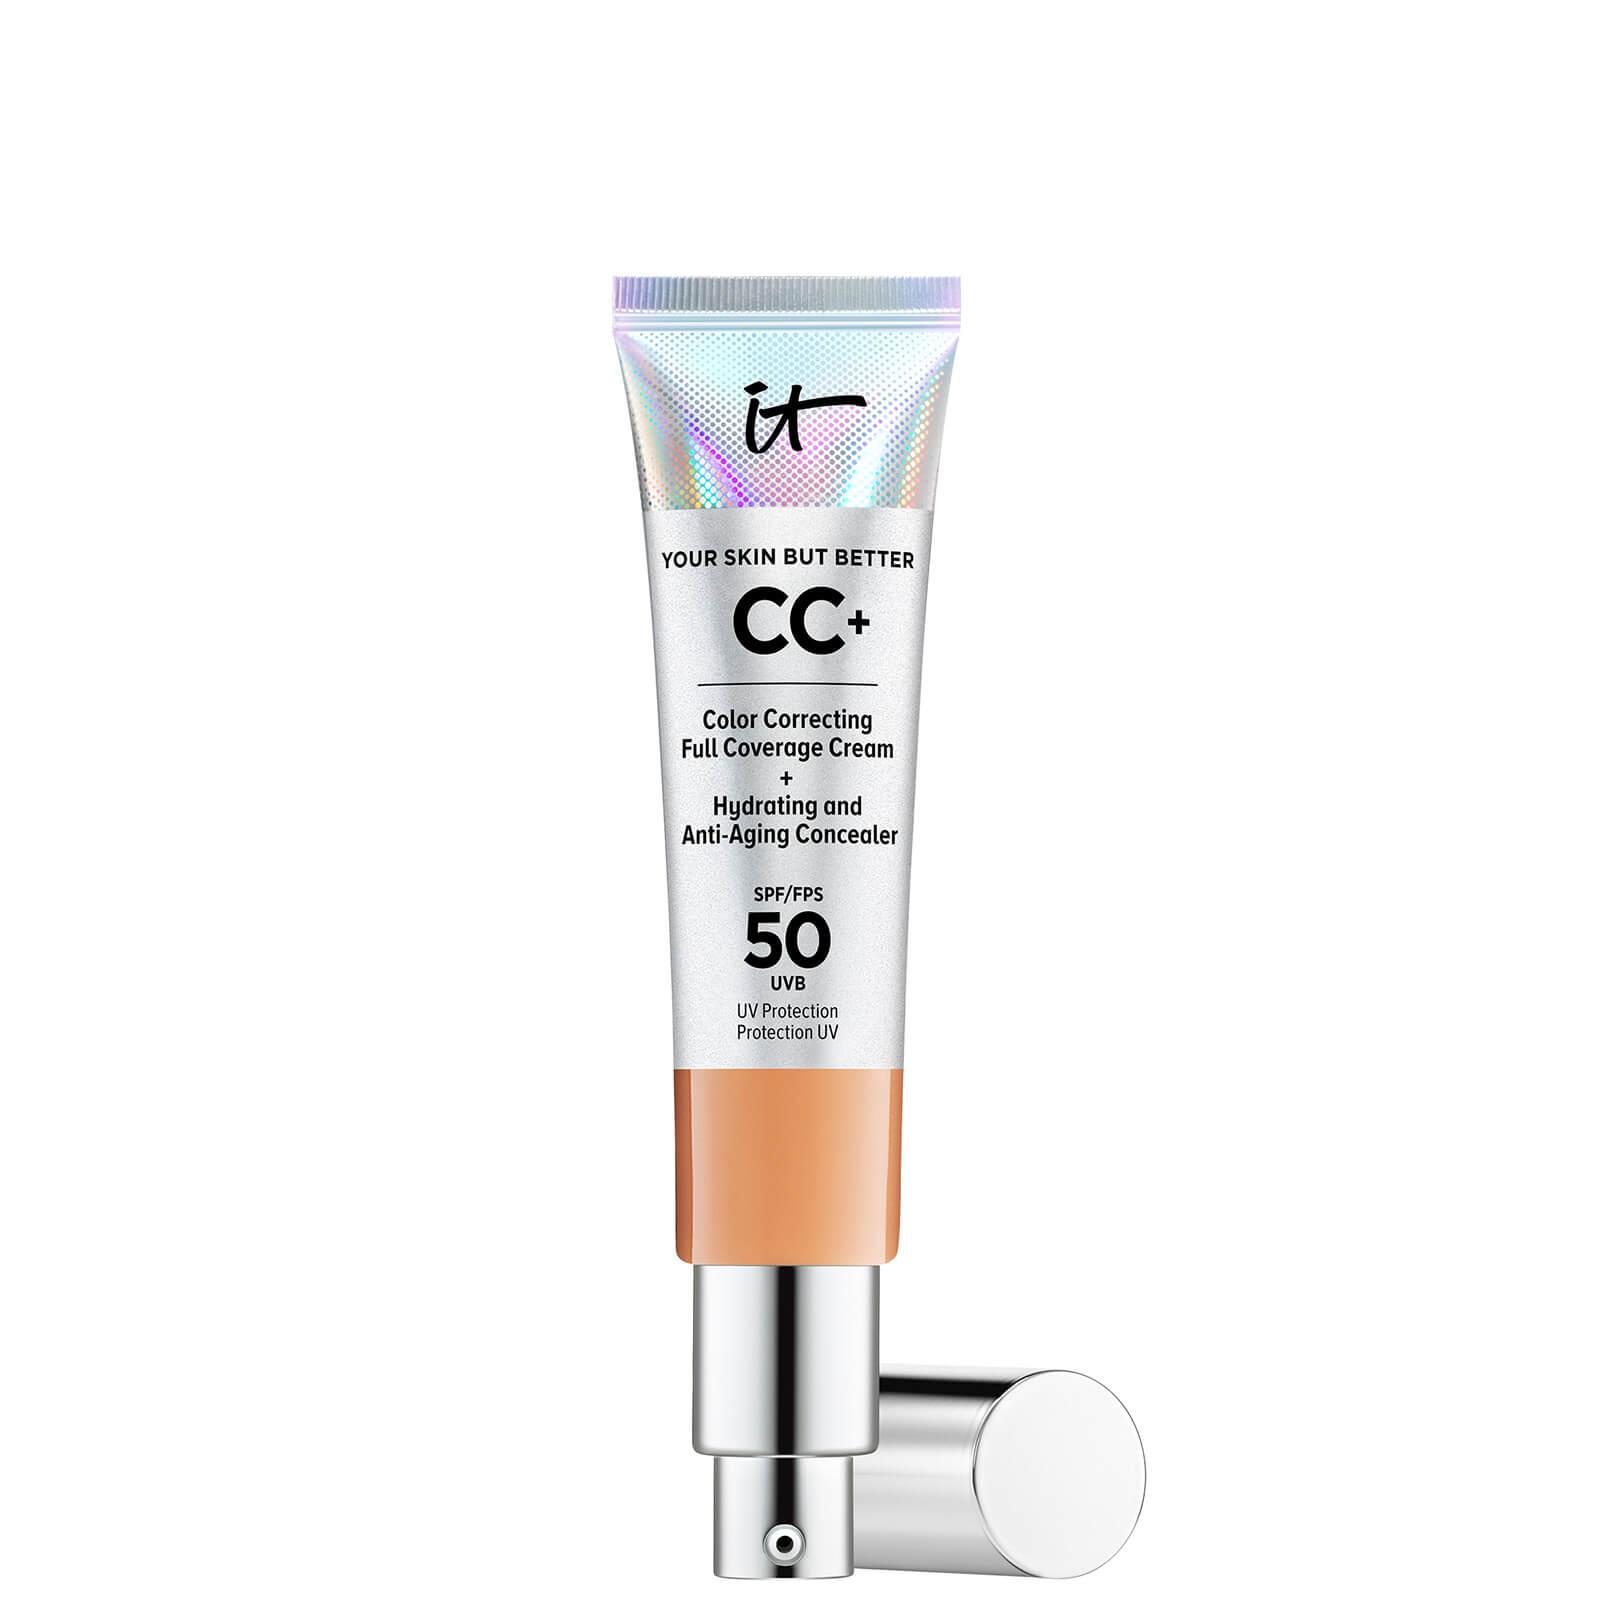 Купить IT Cosmetics Your Skin But Better CC+ Cream with SPF50 32ml (Various Shades) - Tan